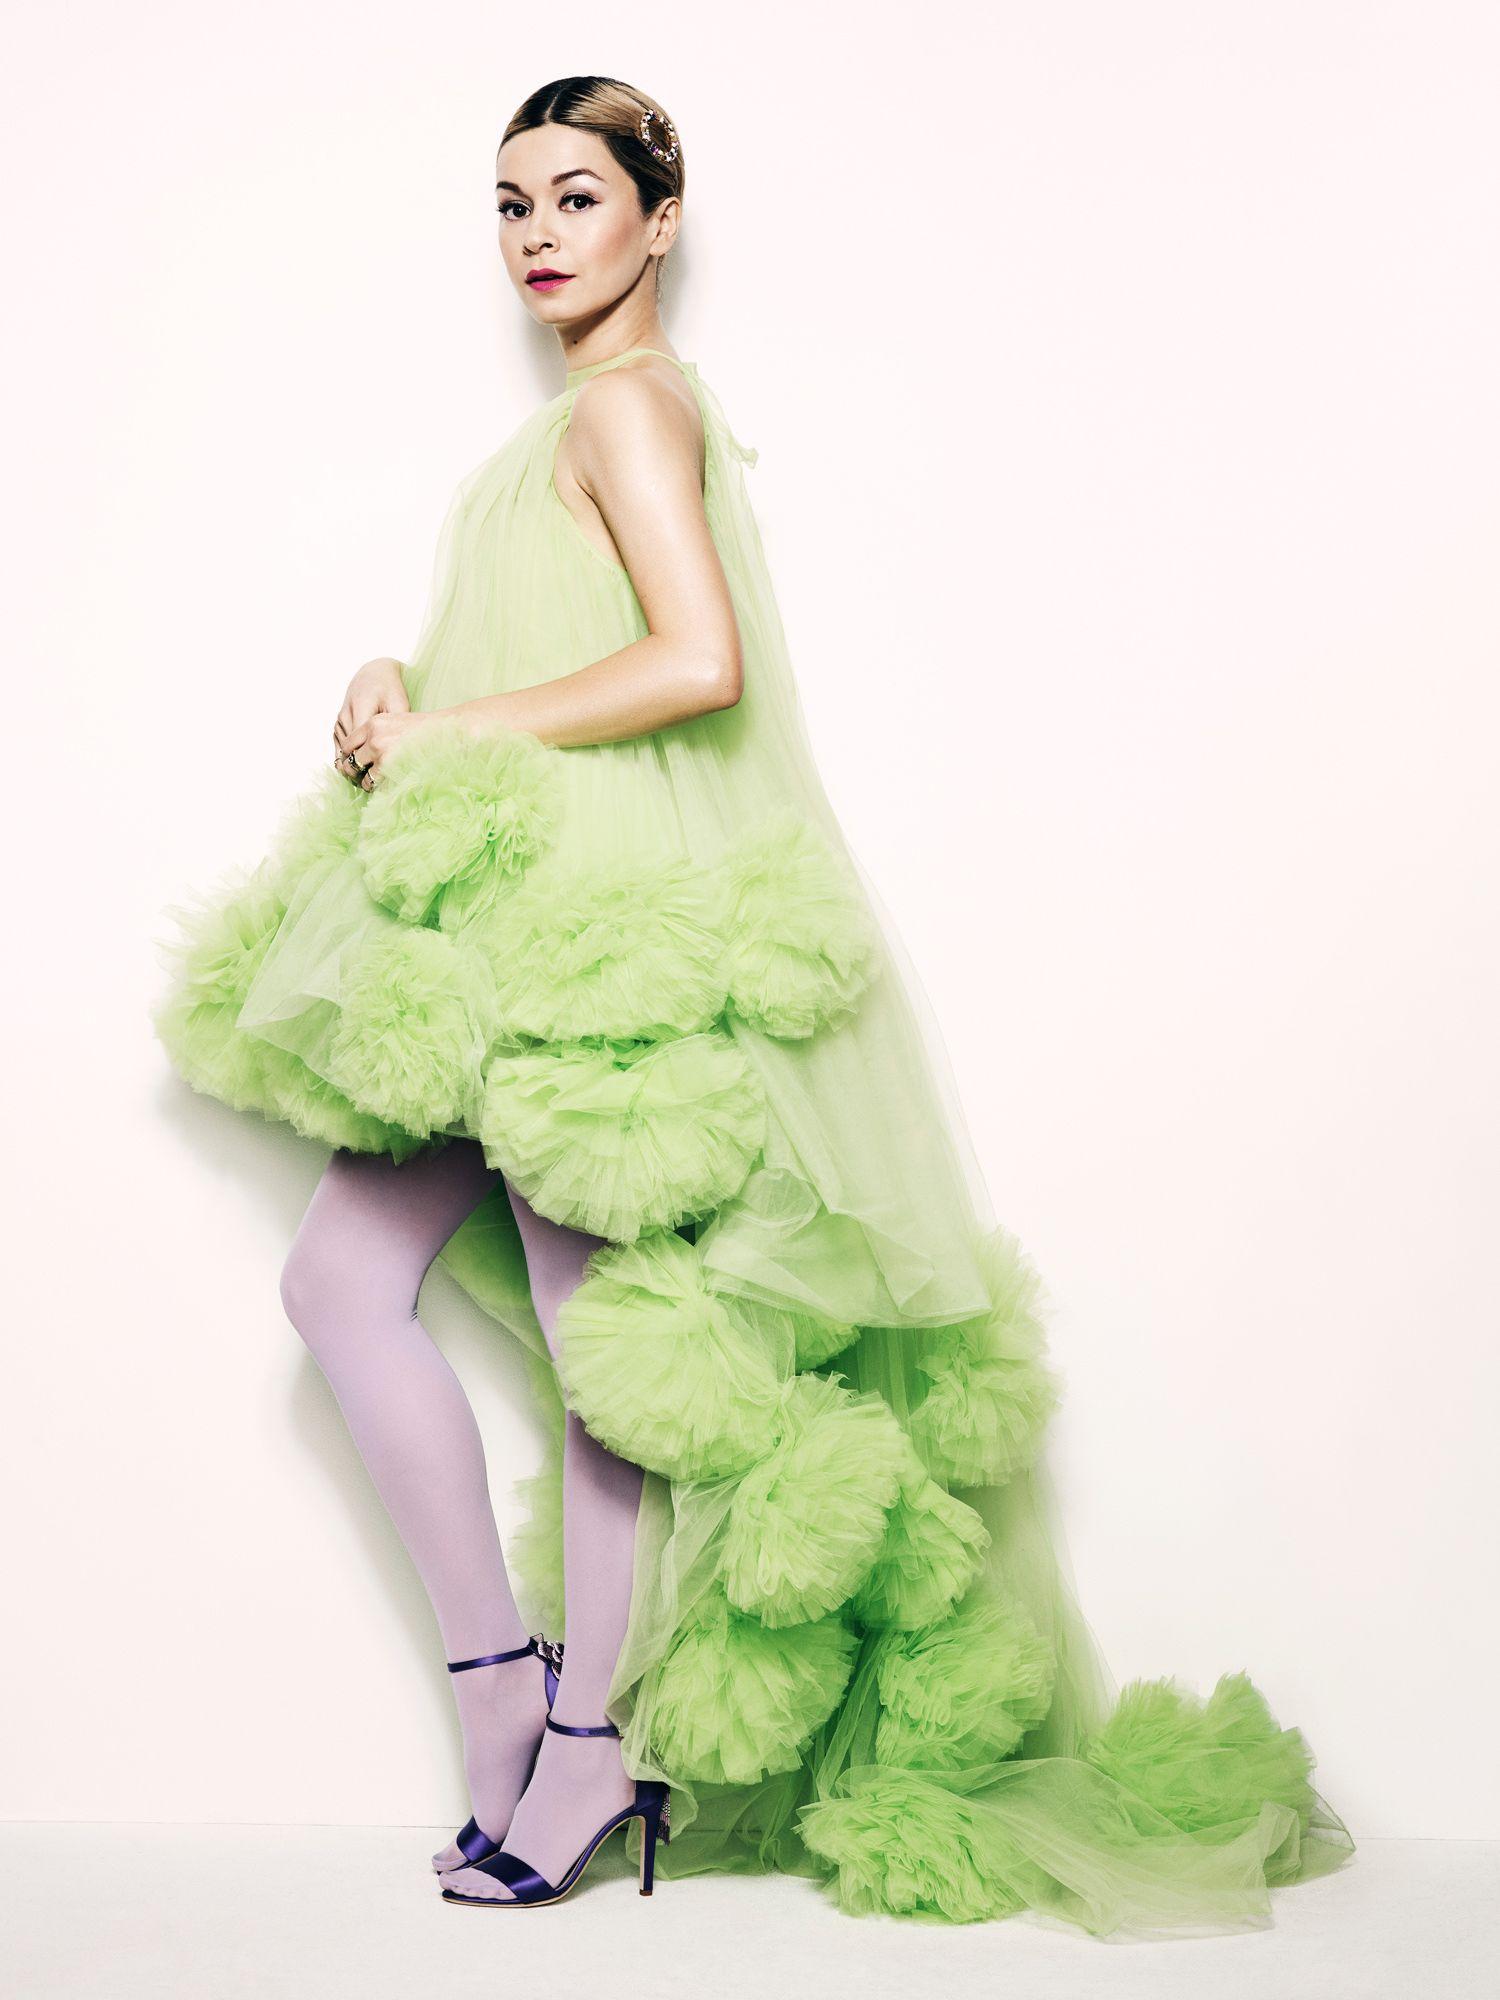 Julia Chan wearing a long, fluffy mint green gown